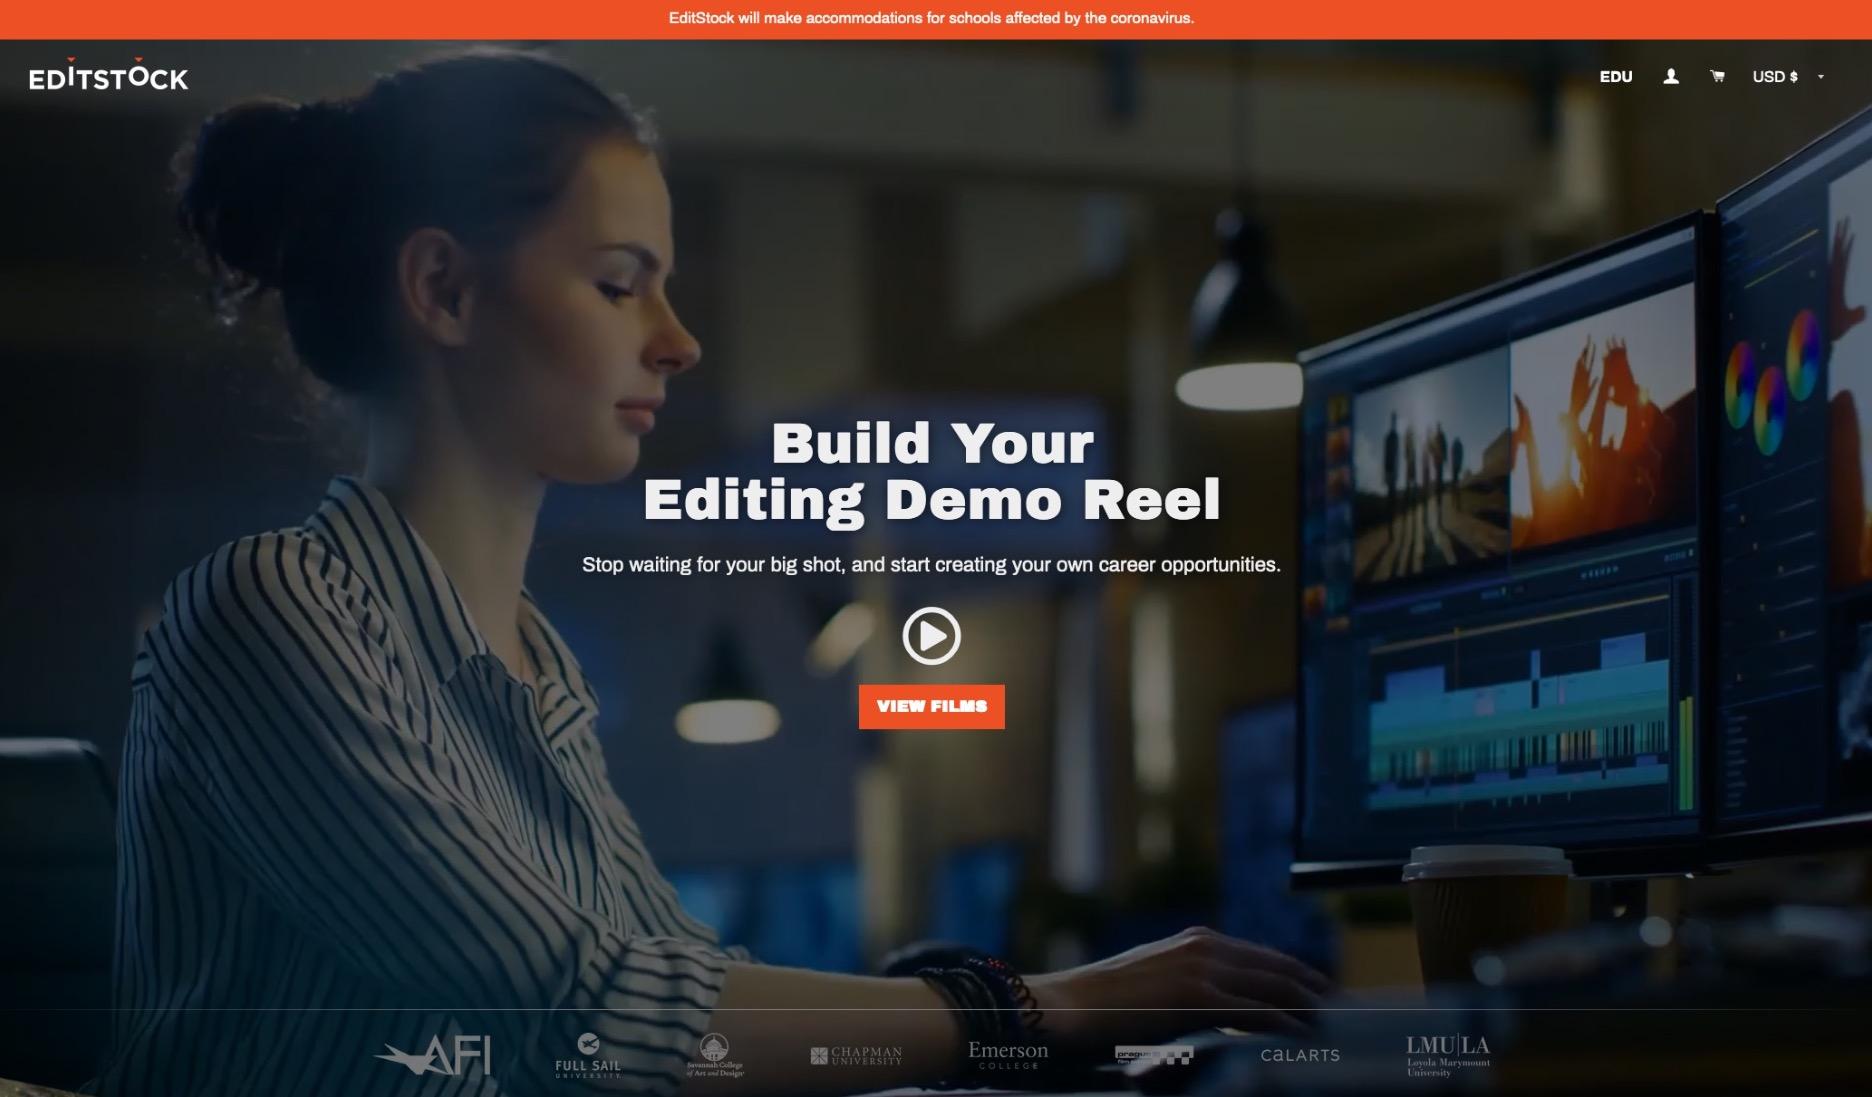 Editstock Splash Screen 2